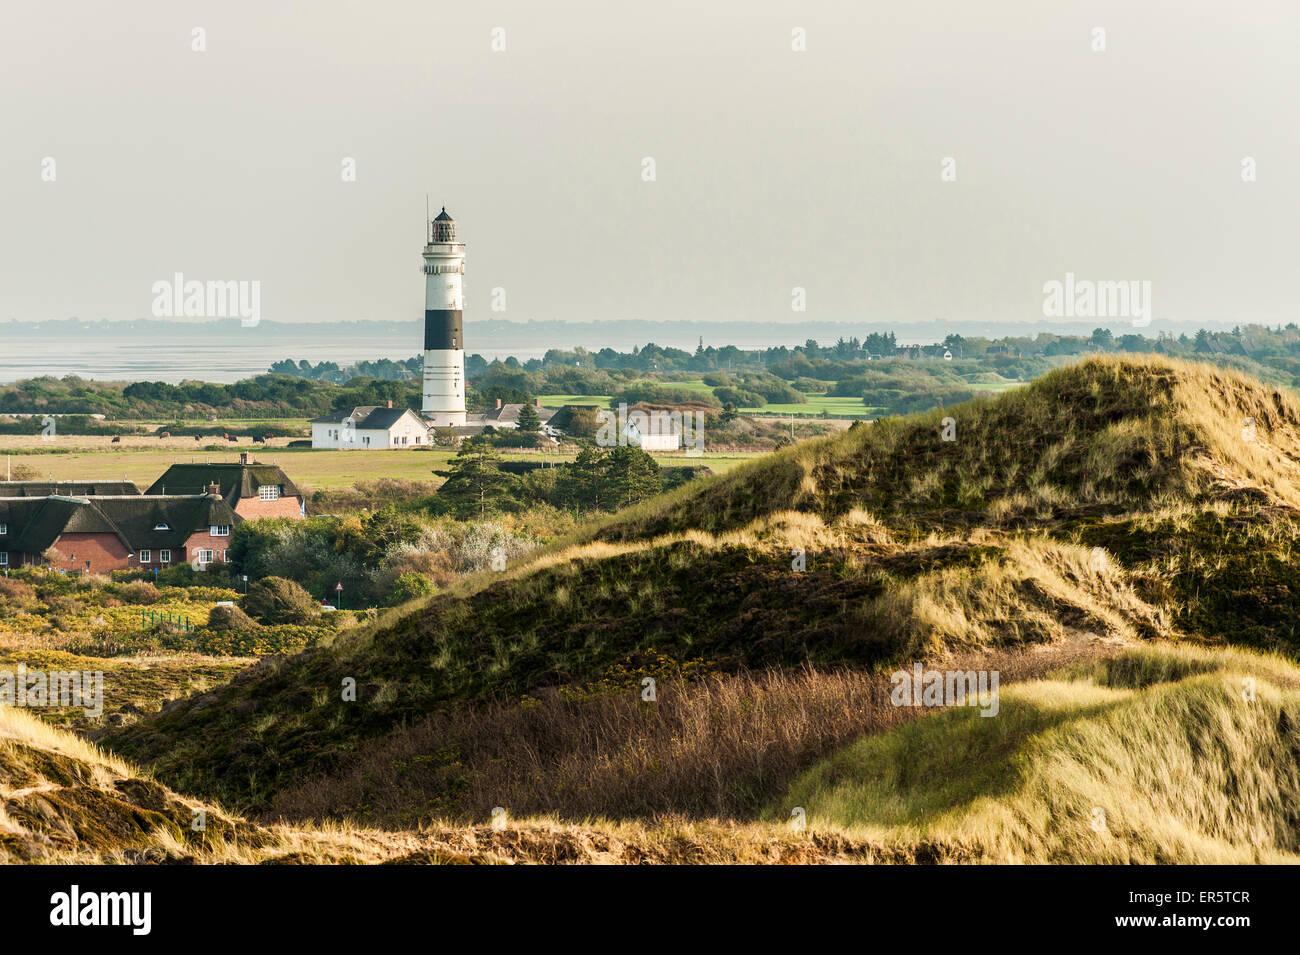 Lighthouse, Kampen, Sylt, Schleswig-Holstein, Germany - Stock Image